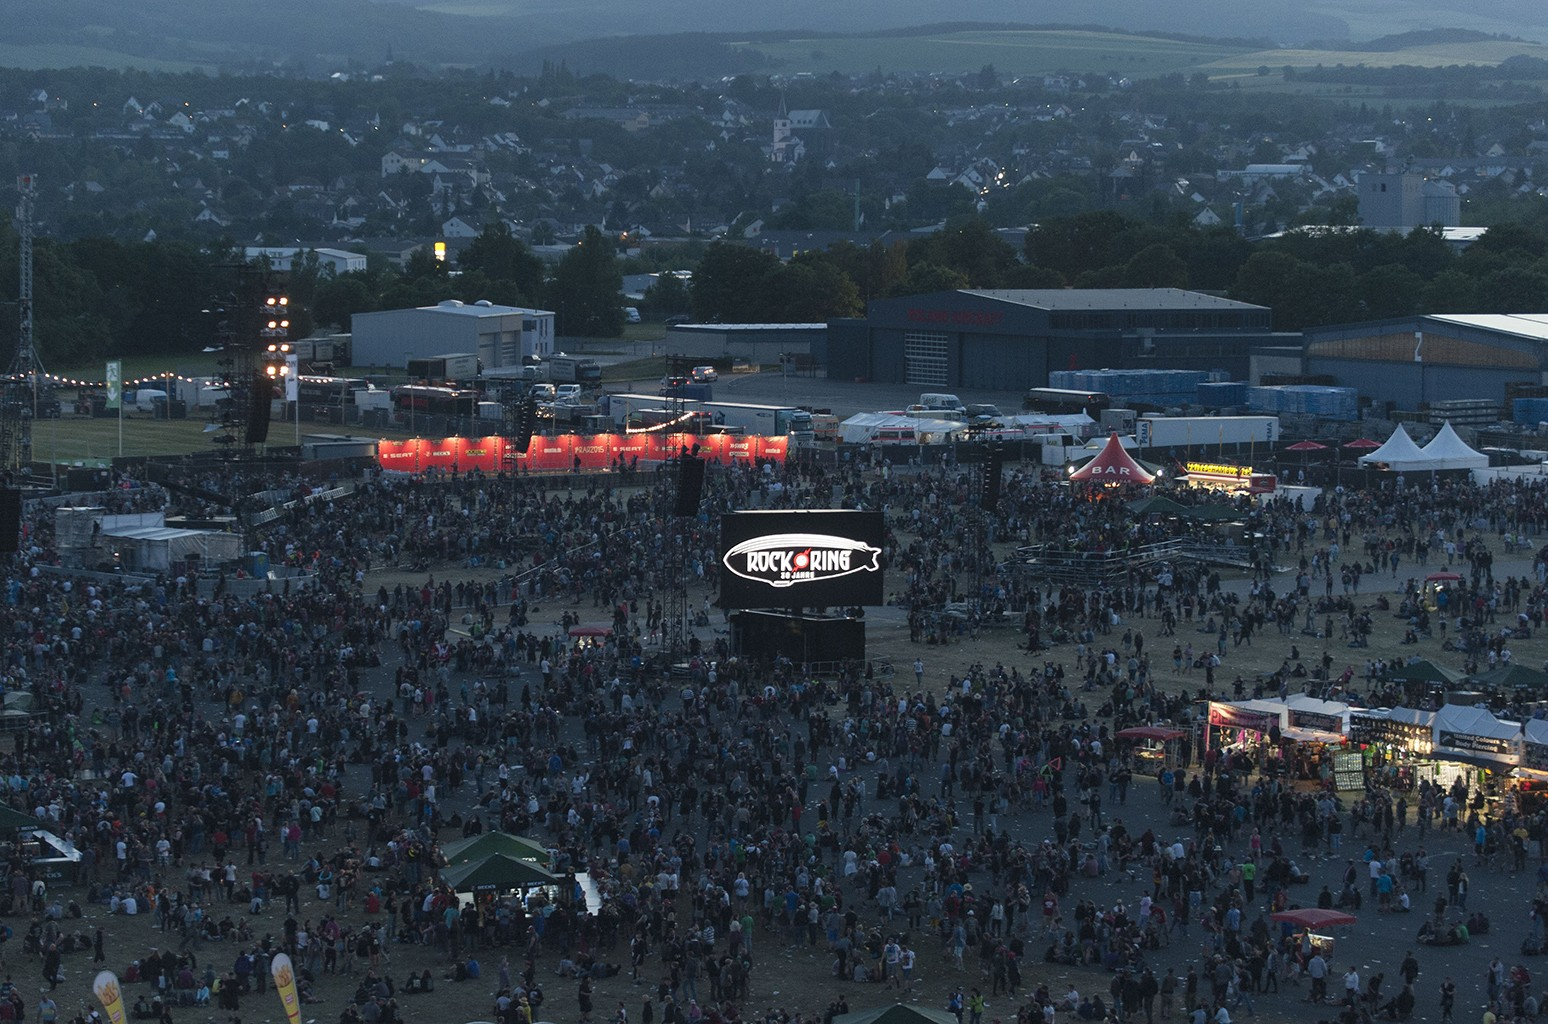 Germany's Rock am Ring Festival